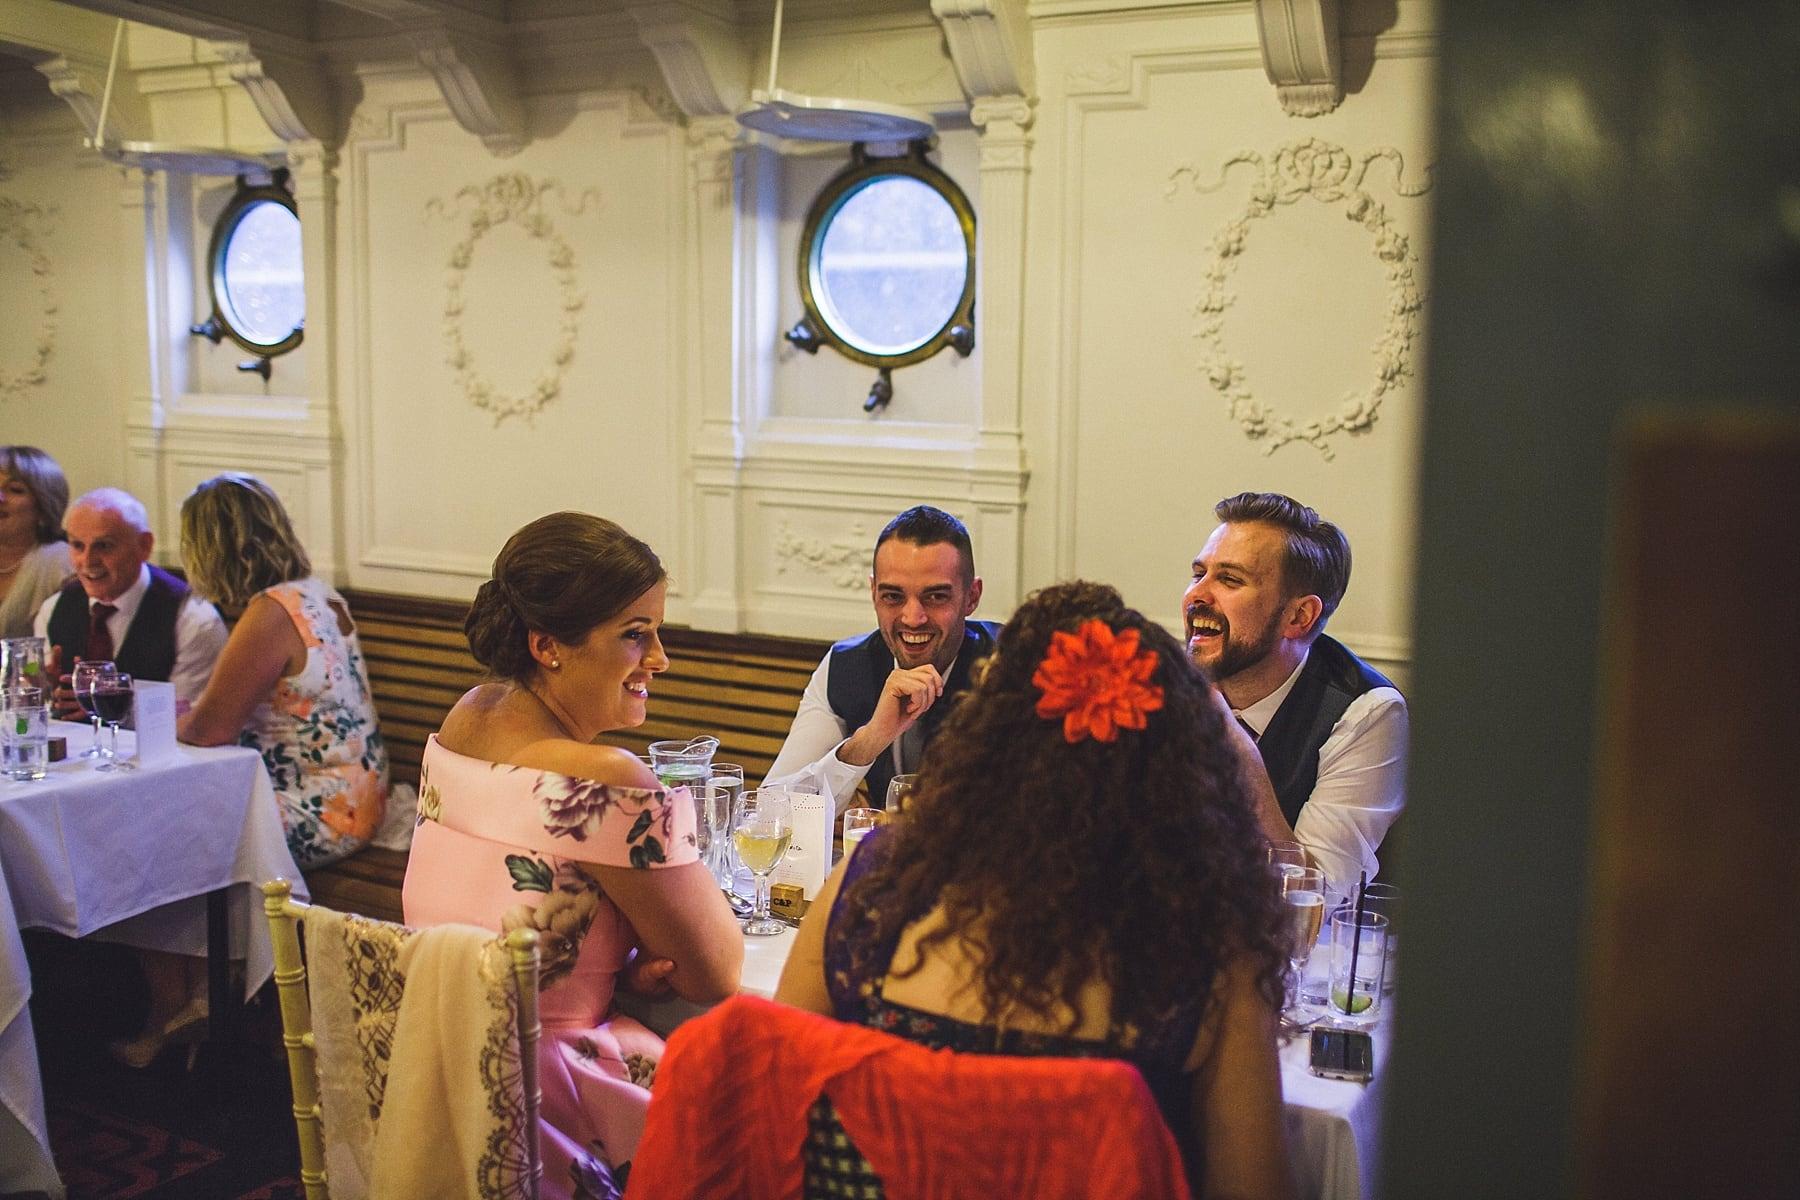 titanic quarter,SS nomadic,boat,wedding,belfast city photographer,wedding stationary,posh nosh catering,speeches,bride and groom,laughter,